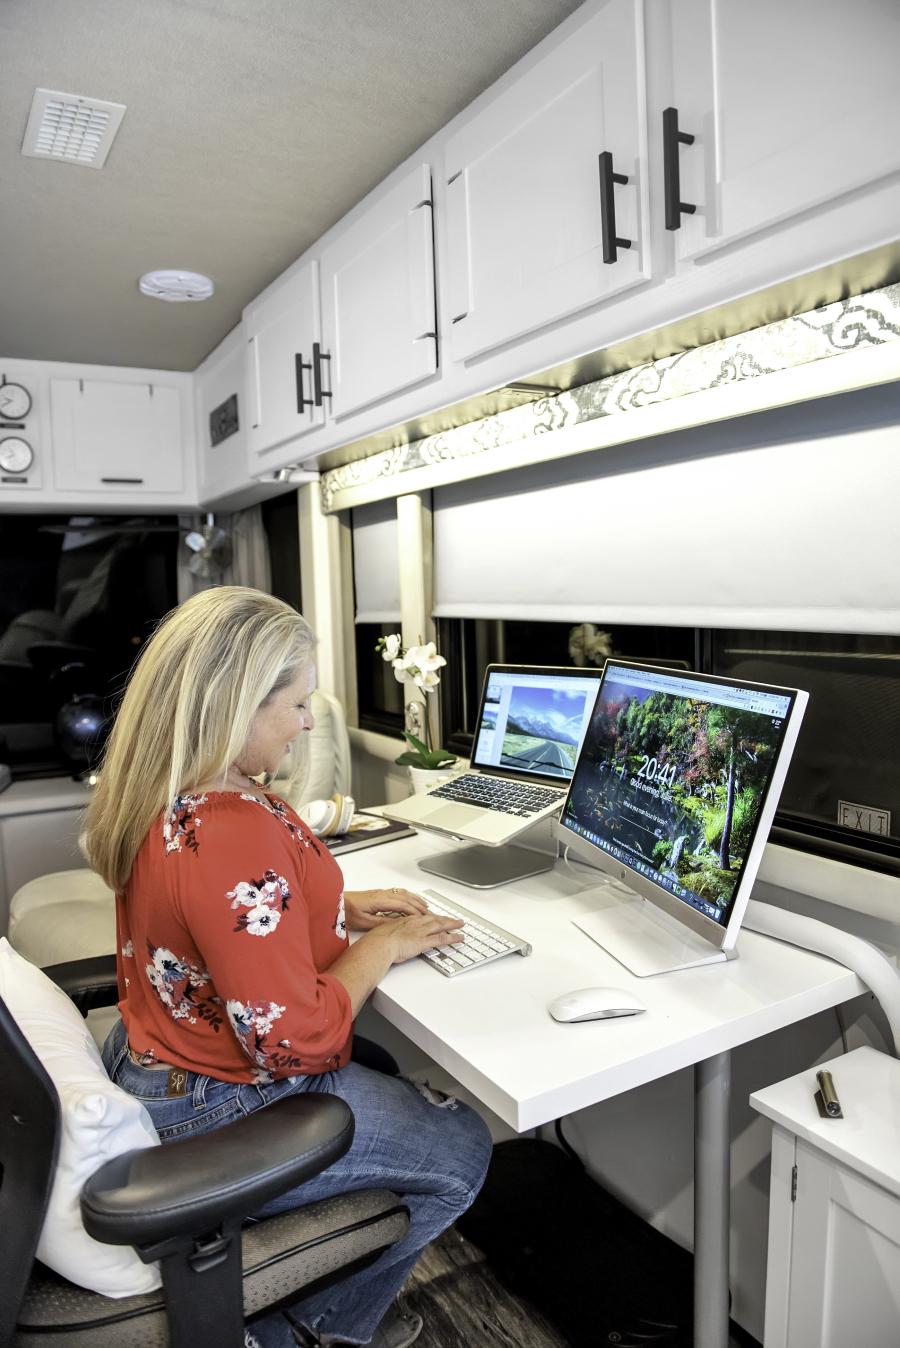 Contemporary RV workspace from RVlove.com